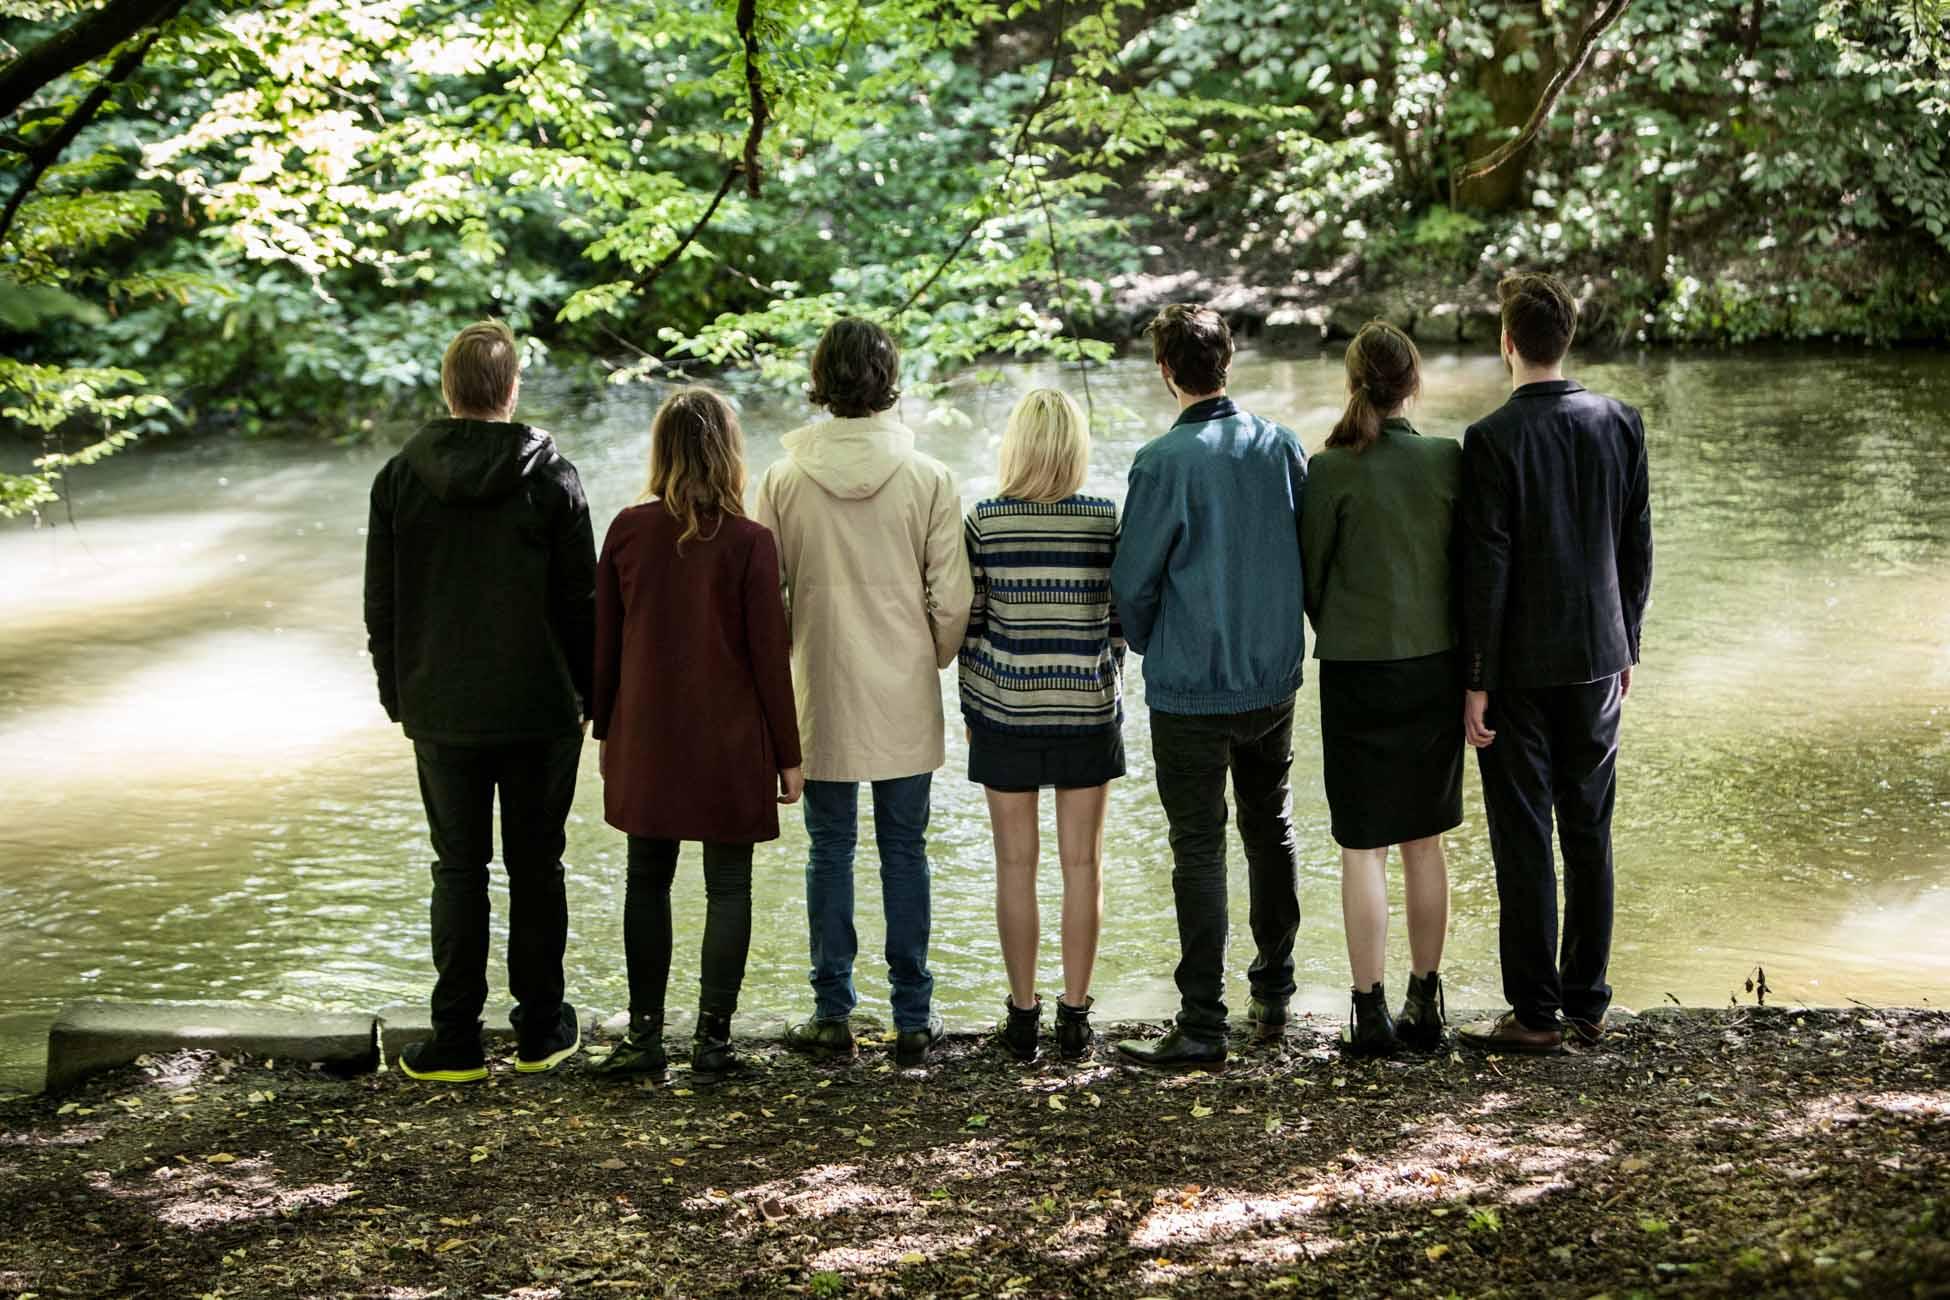 akjumii gruppe freunde fluss im grünen jacken fashion modekollektion mode münchen jörn strojny